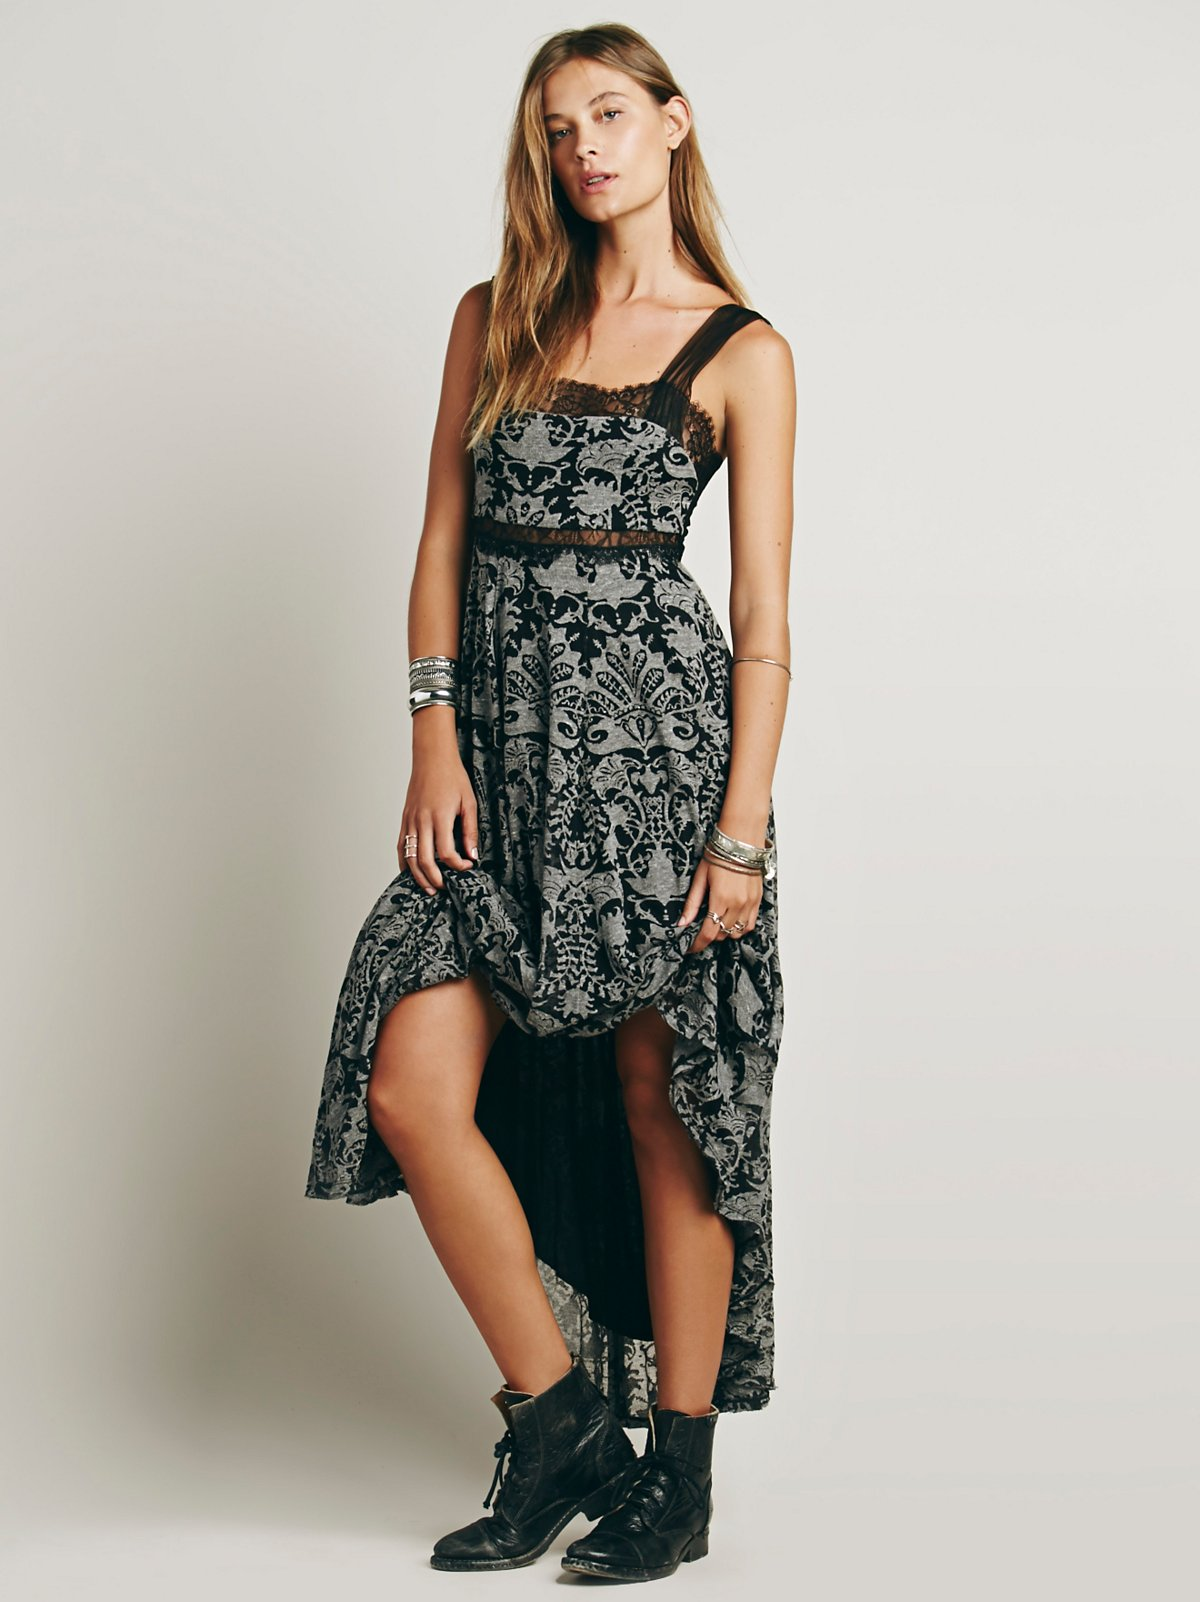 FP X Persephone Dress